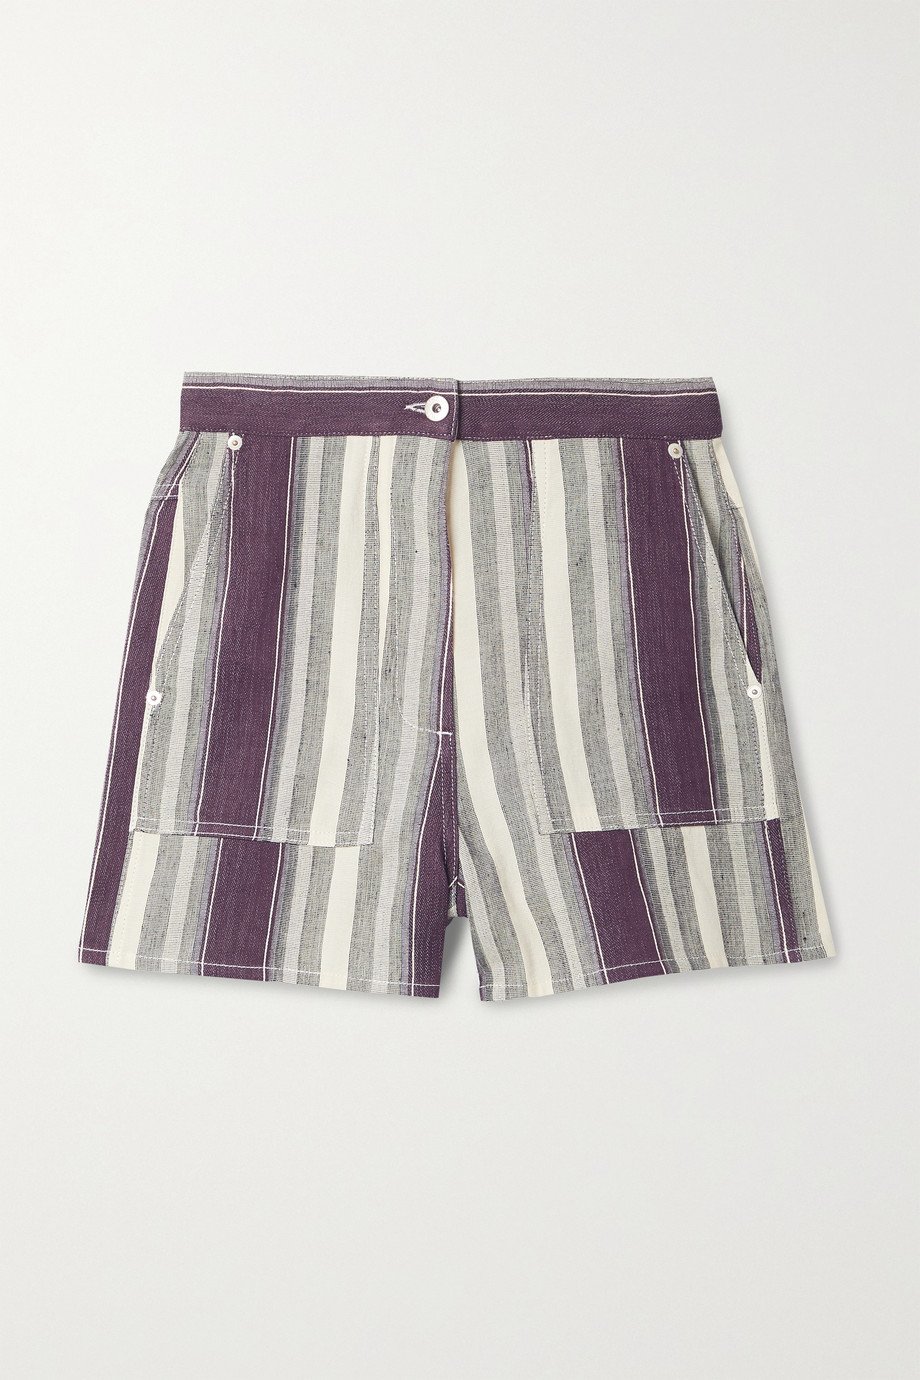 Loewe Short en lin et coton mélangés à rayures x Paula's Ibiza